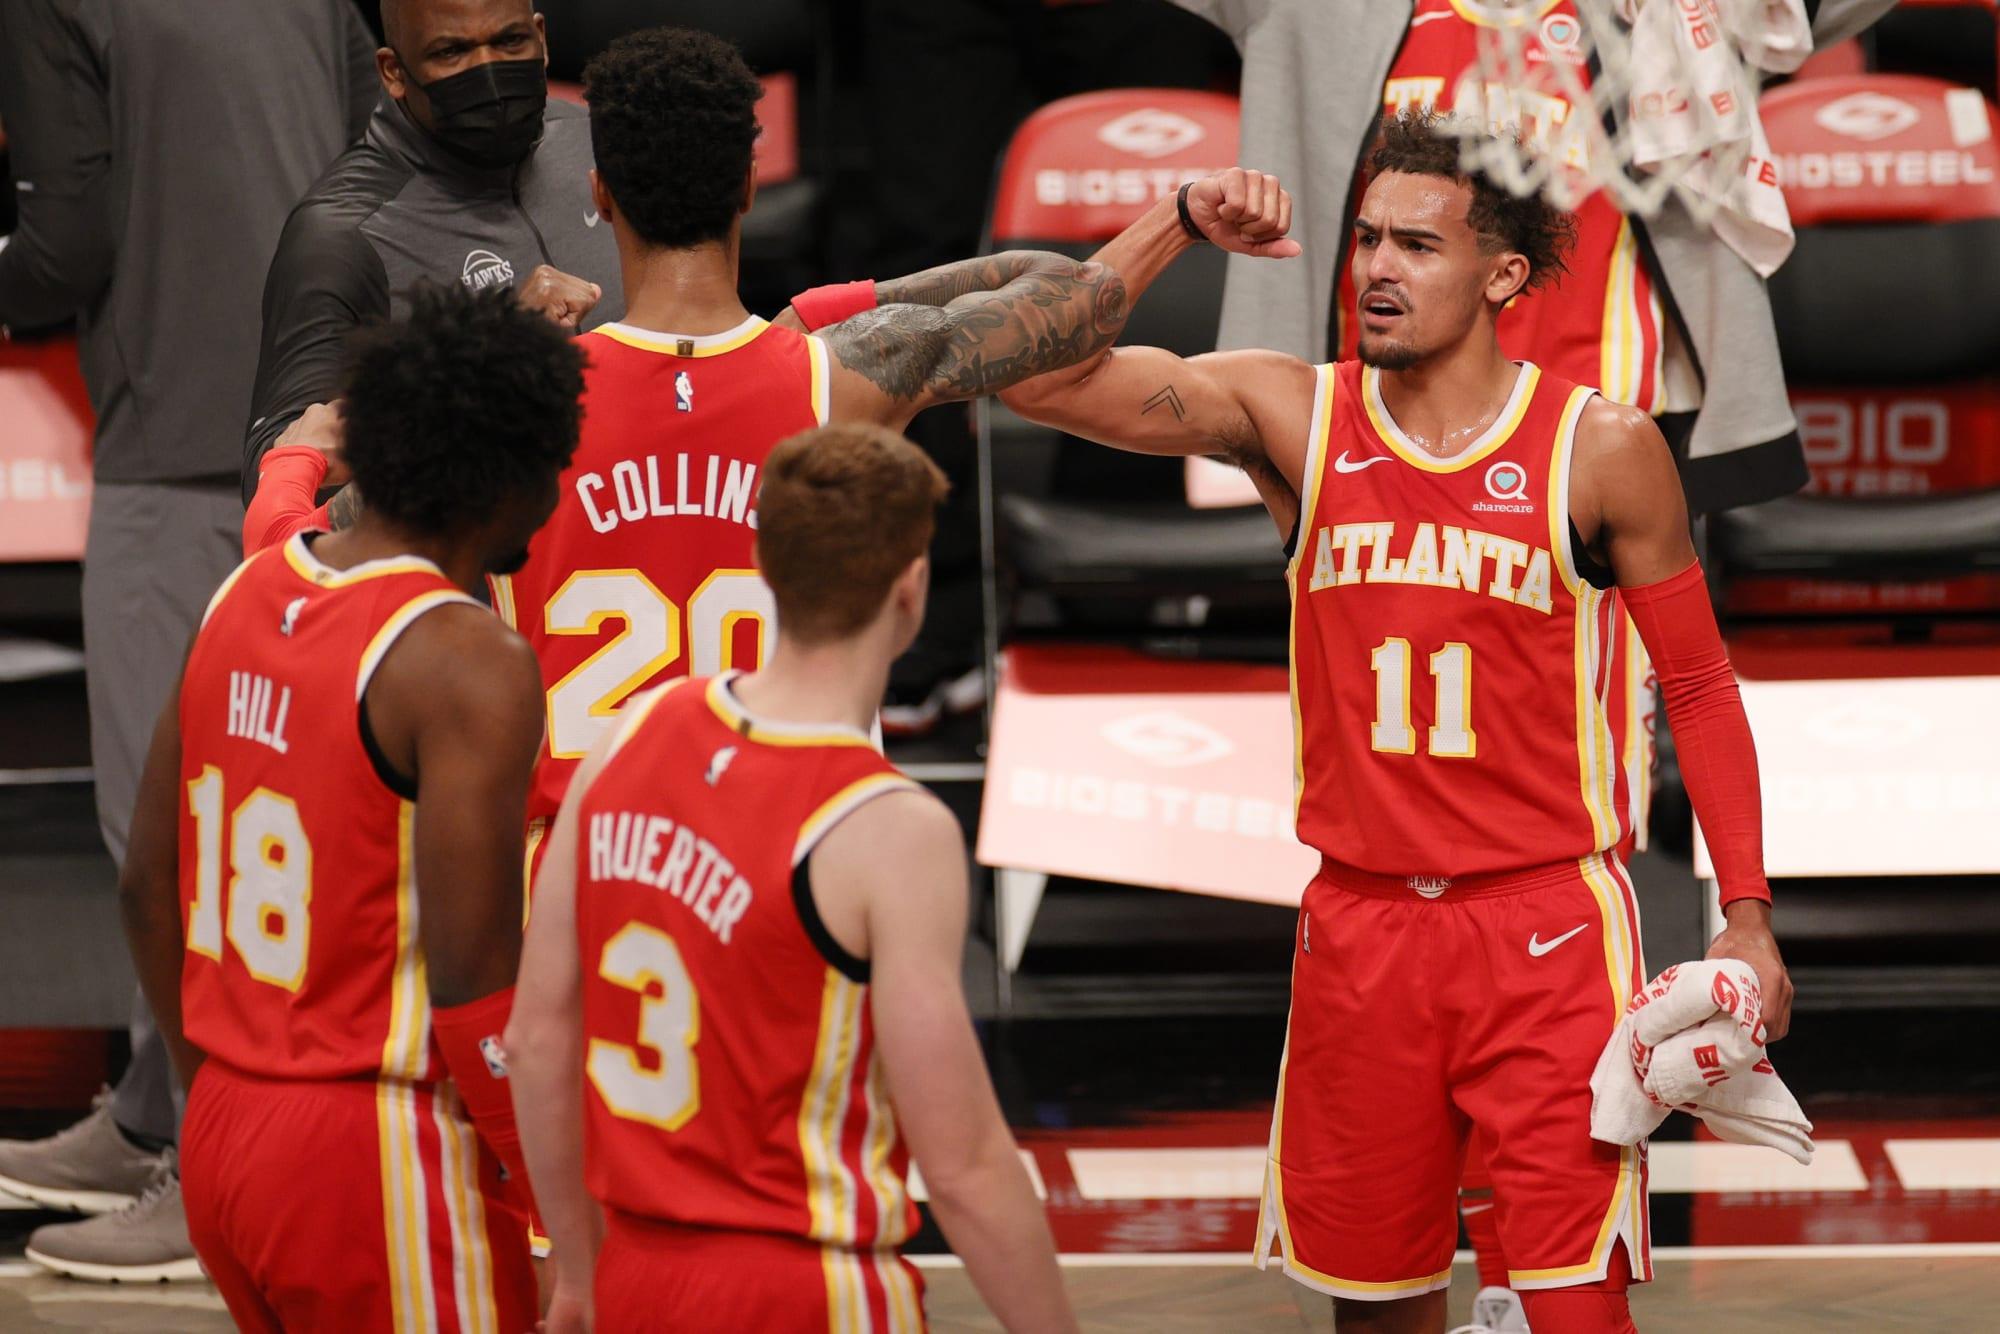 Atlanta Hawks: This year's Hawks are not the same old Hawks